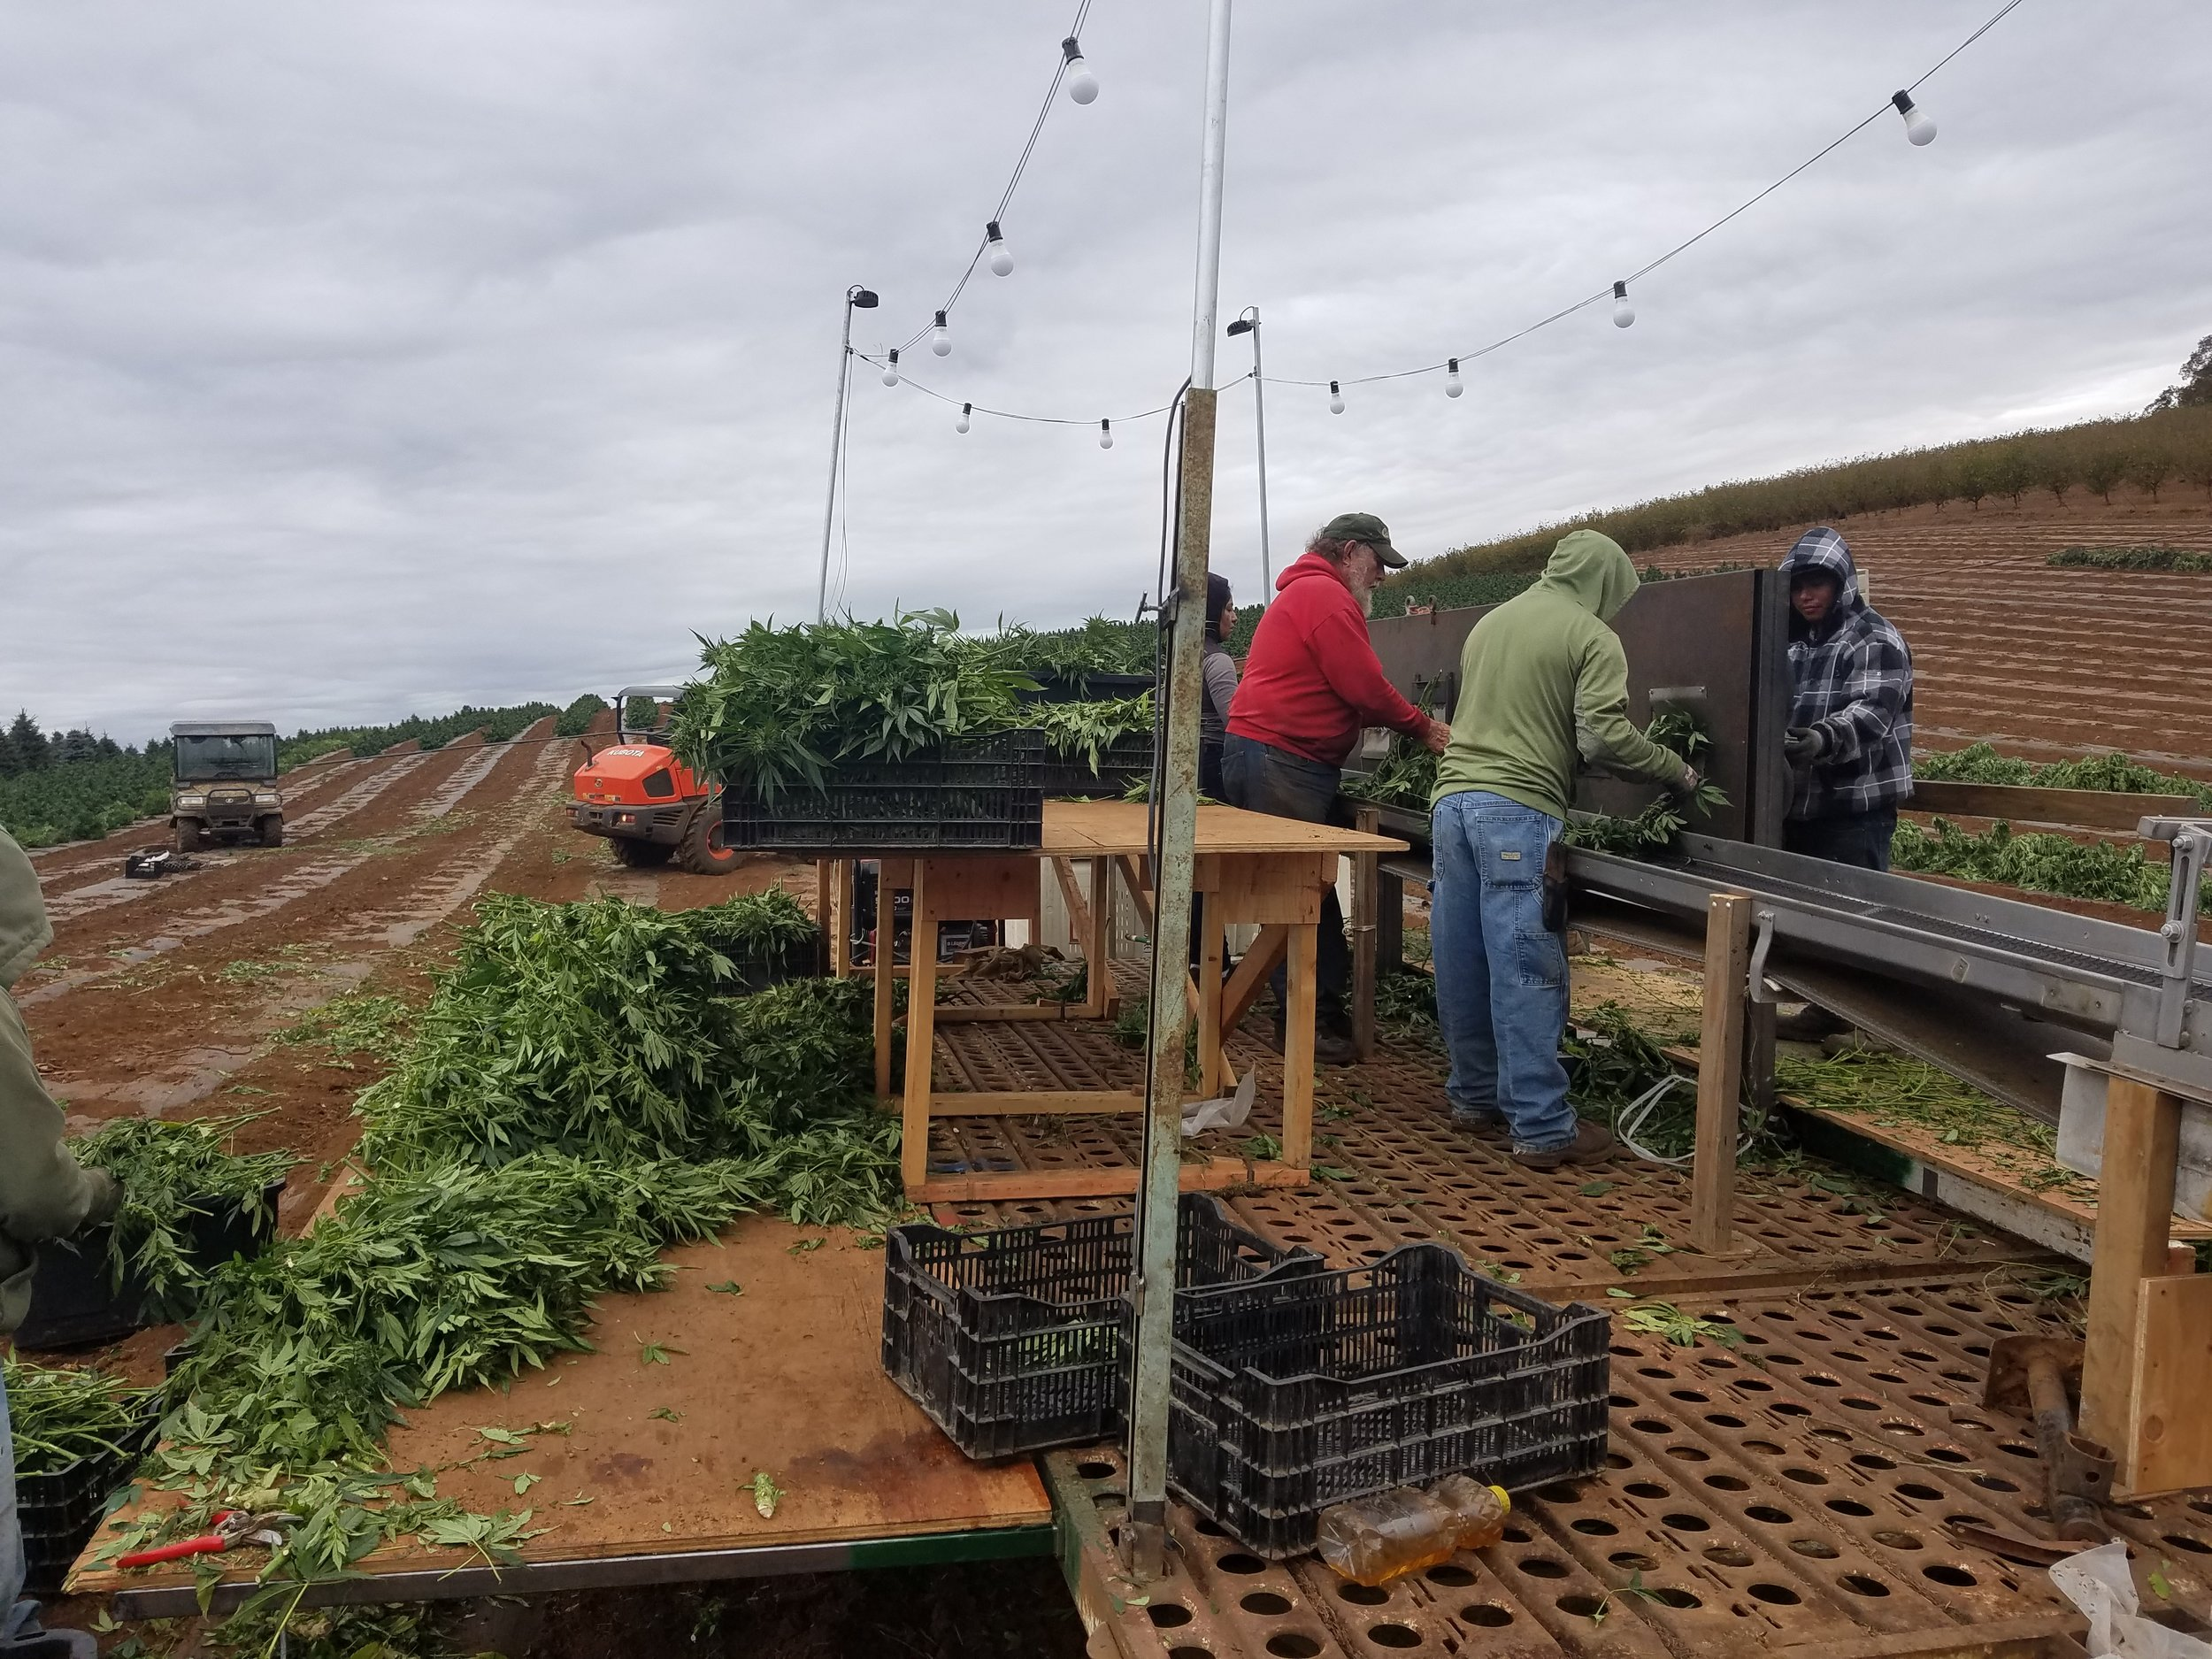 Harvest - Hemp Hand Harvest